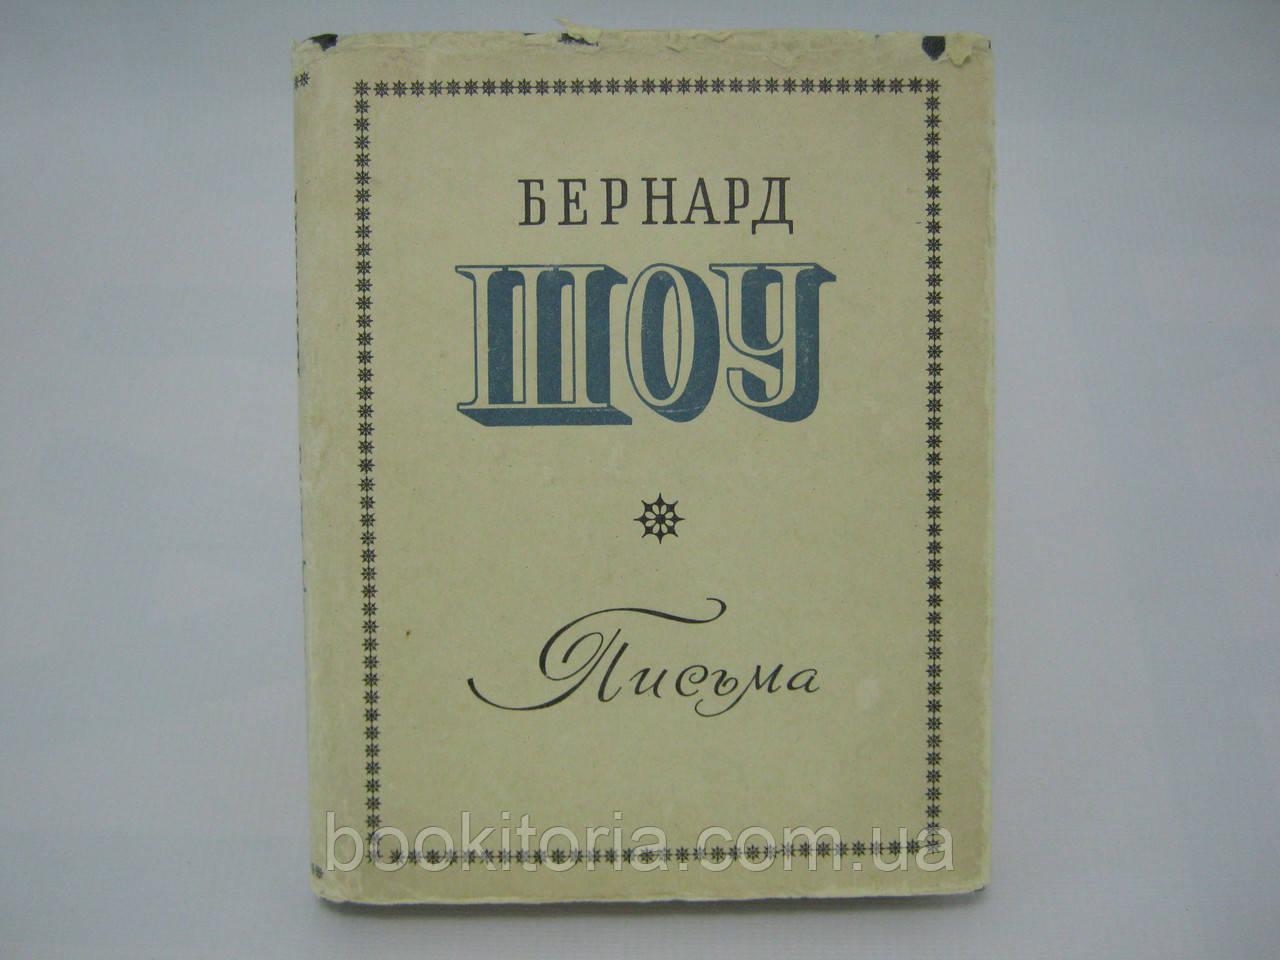 Бернард Шоу. Письма (б/у).